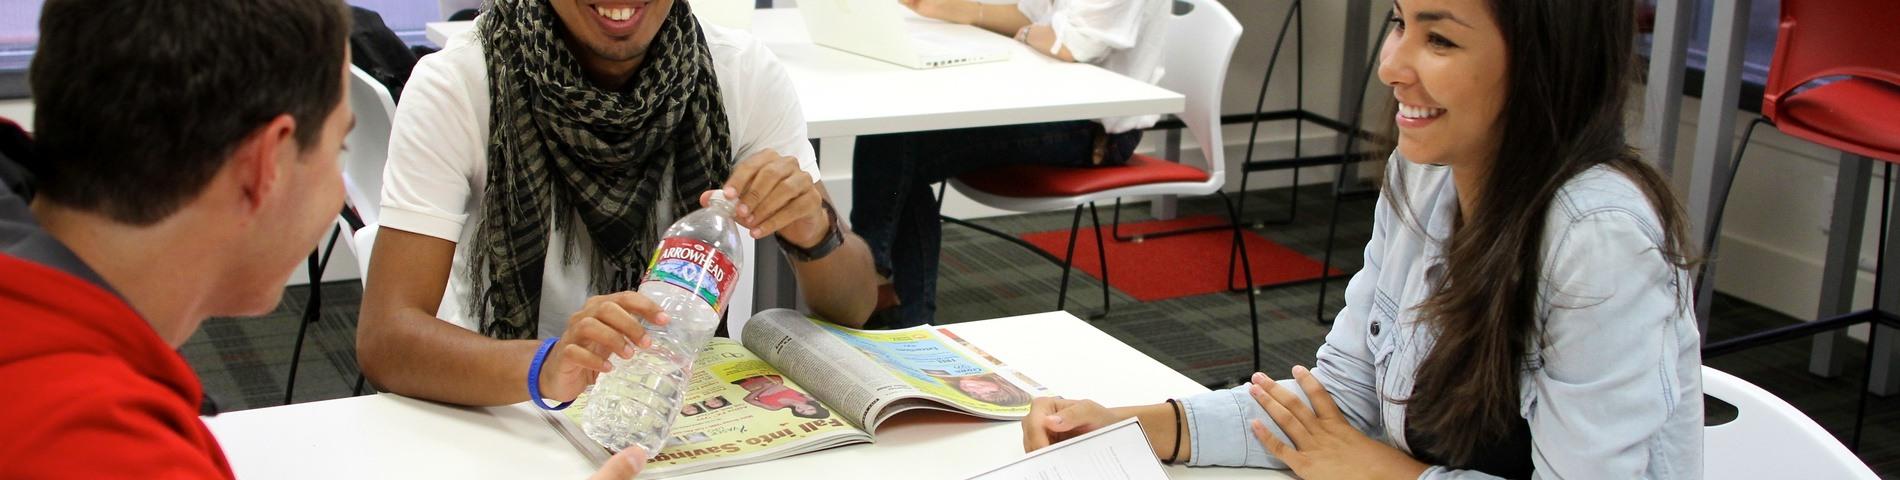 Converse International School of Languages bild 1